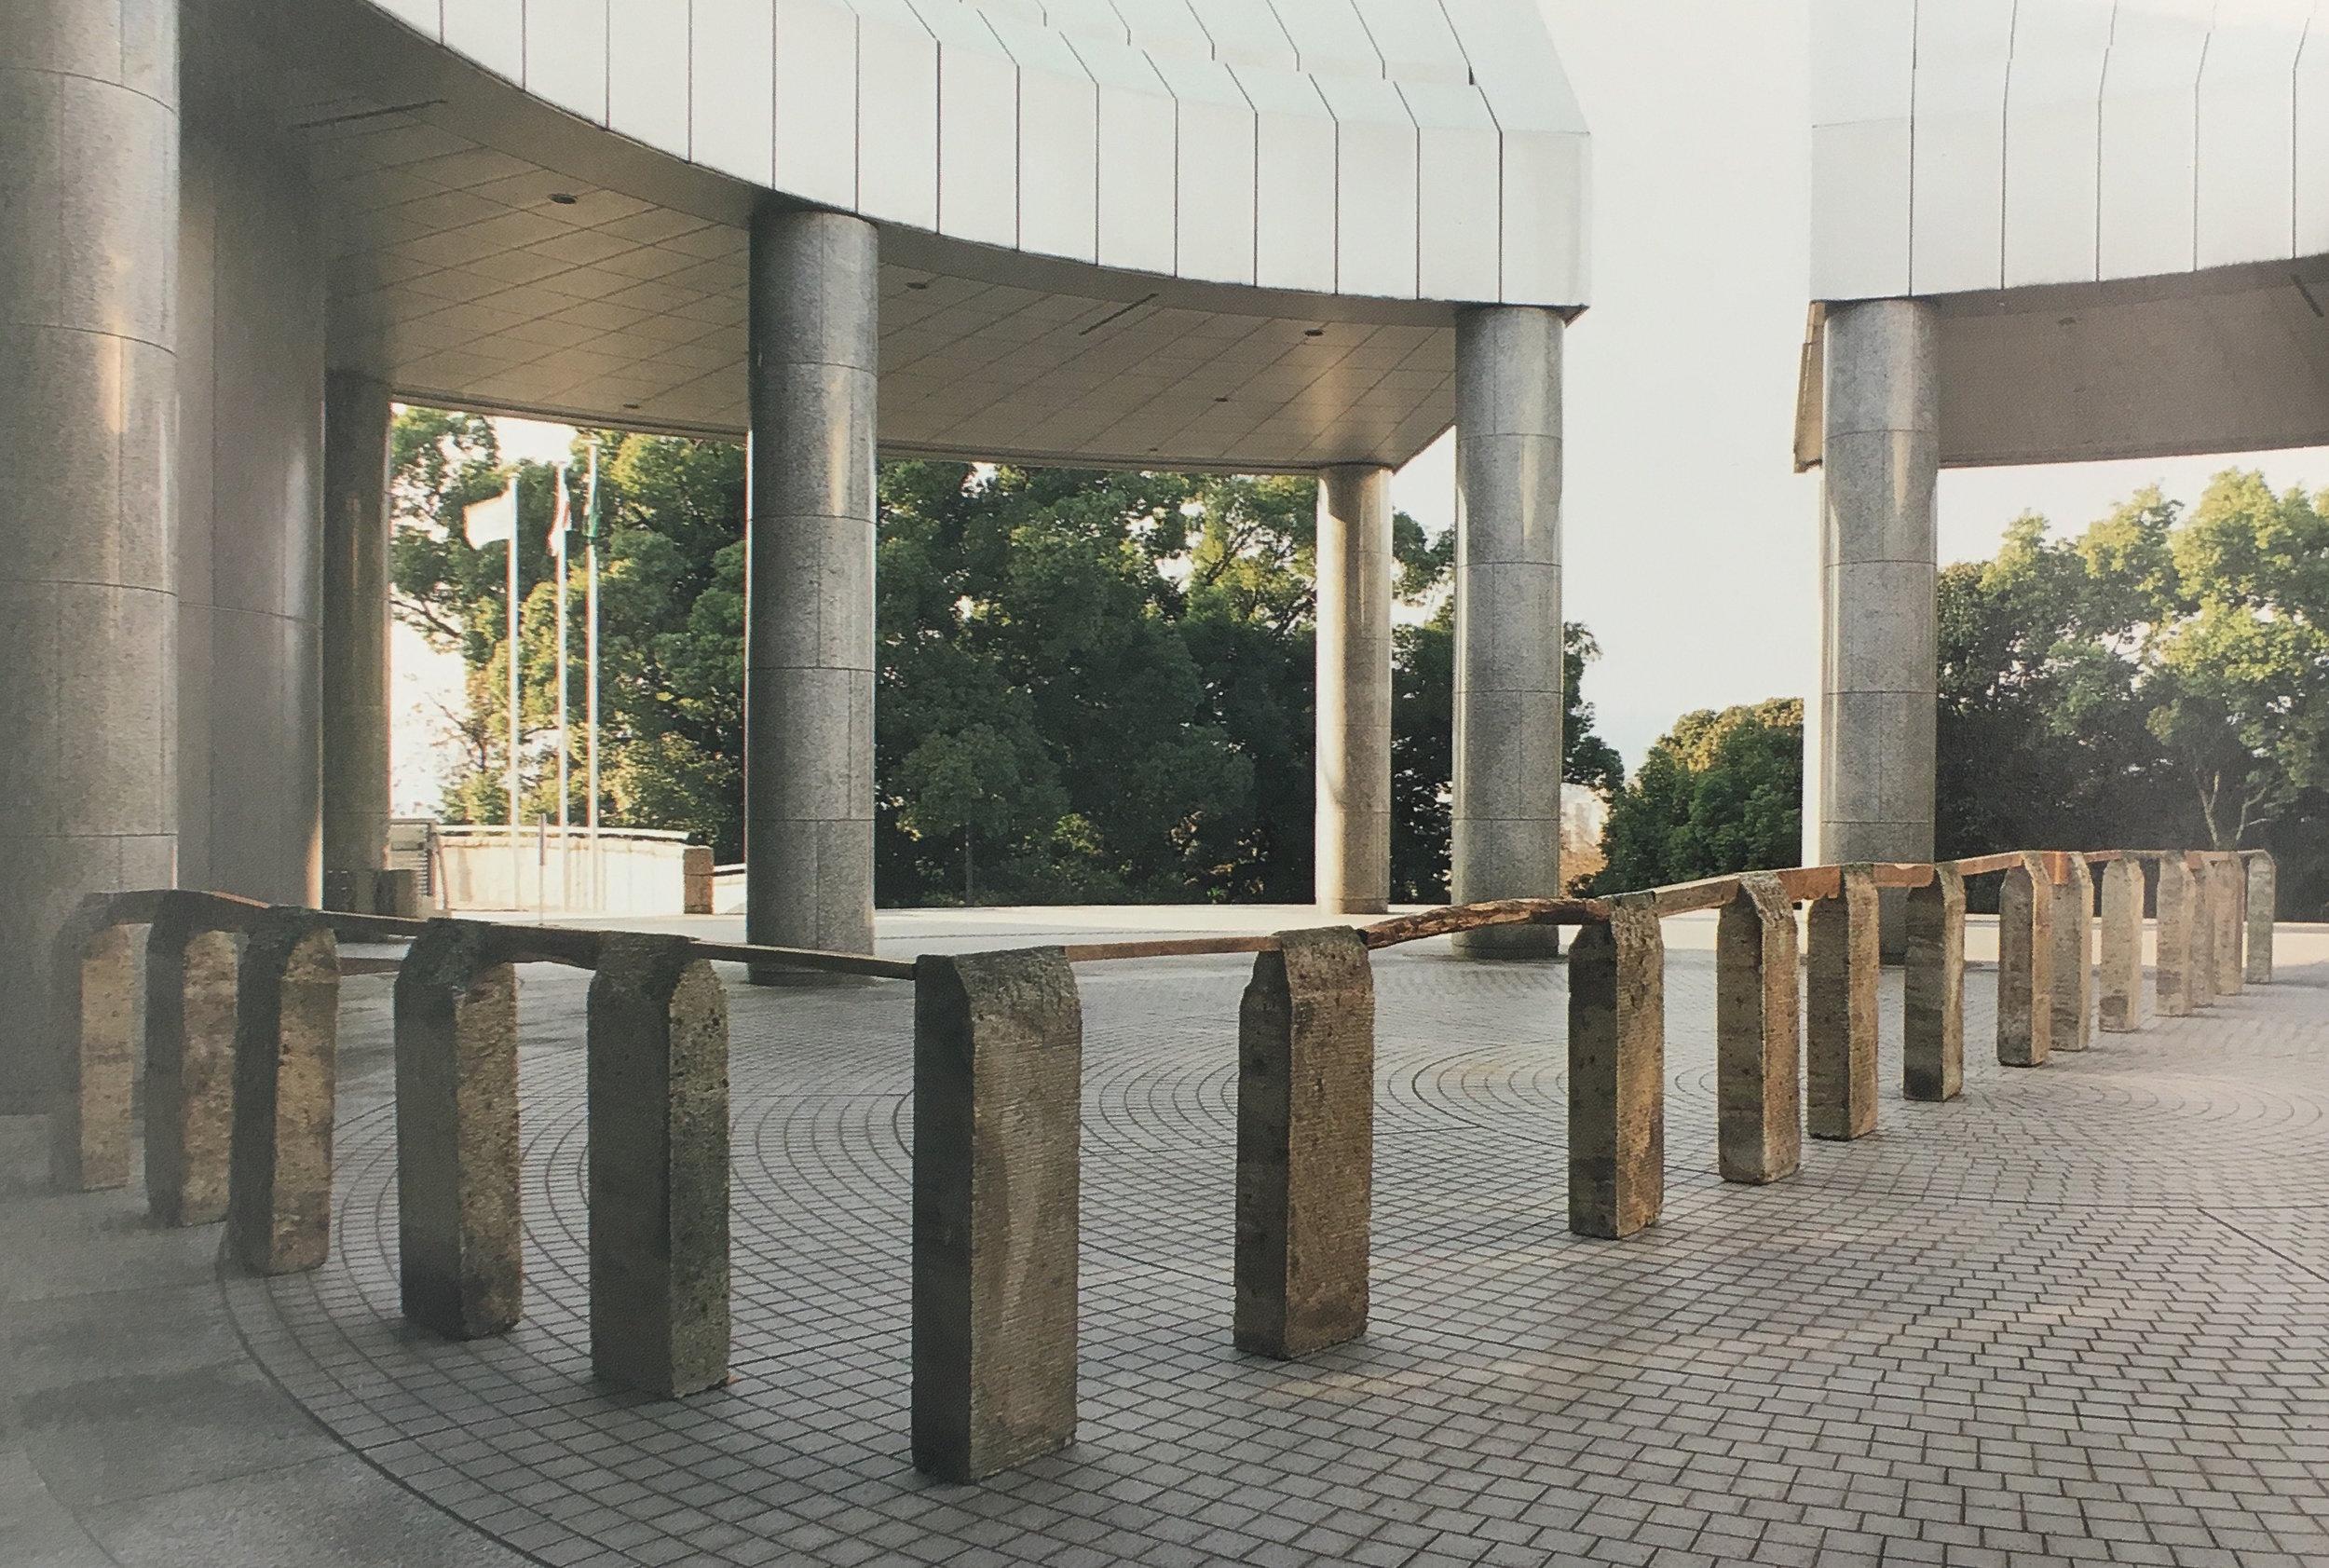 Perimeter , 1985/1989 縁帯 ( Entai ) Oya stone, wood Dimensions variable Installation view,  Kishio Suga ,Hiroshima City Museum of Contemporary Art, 1997 Courtesy Hiroshima City Museum of Contemporary Art